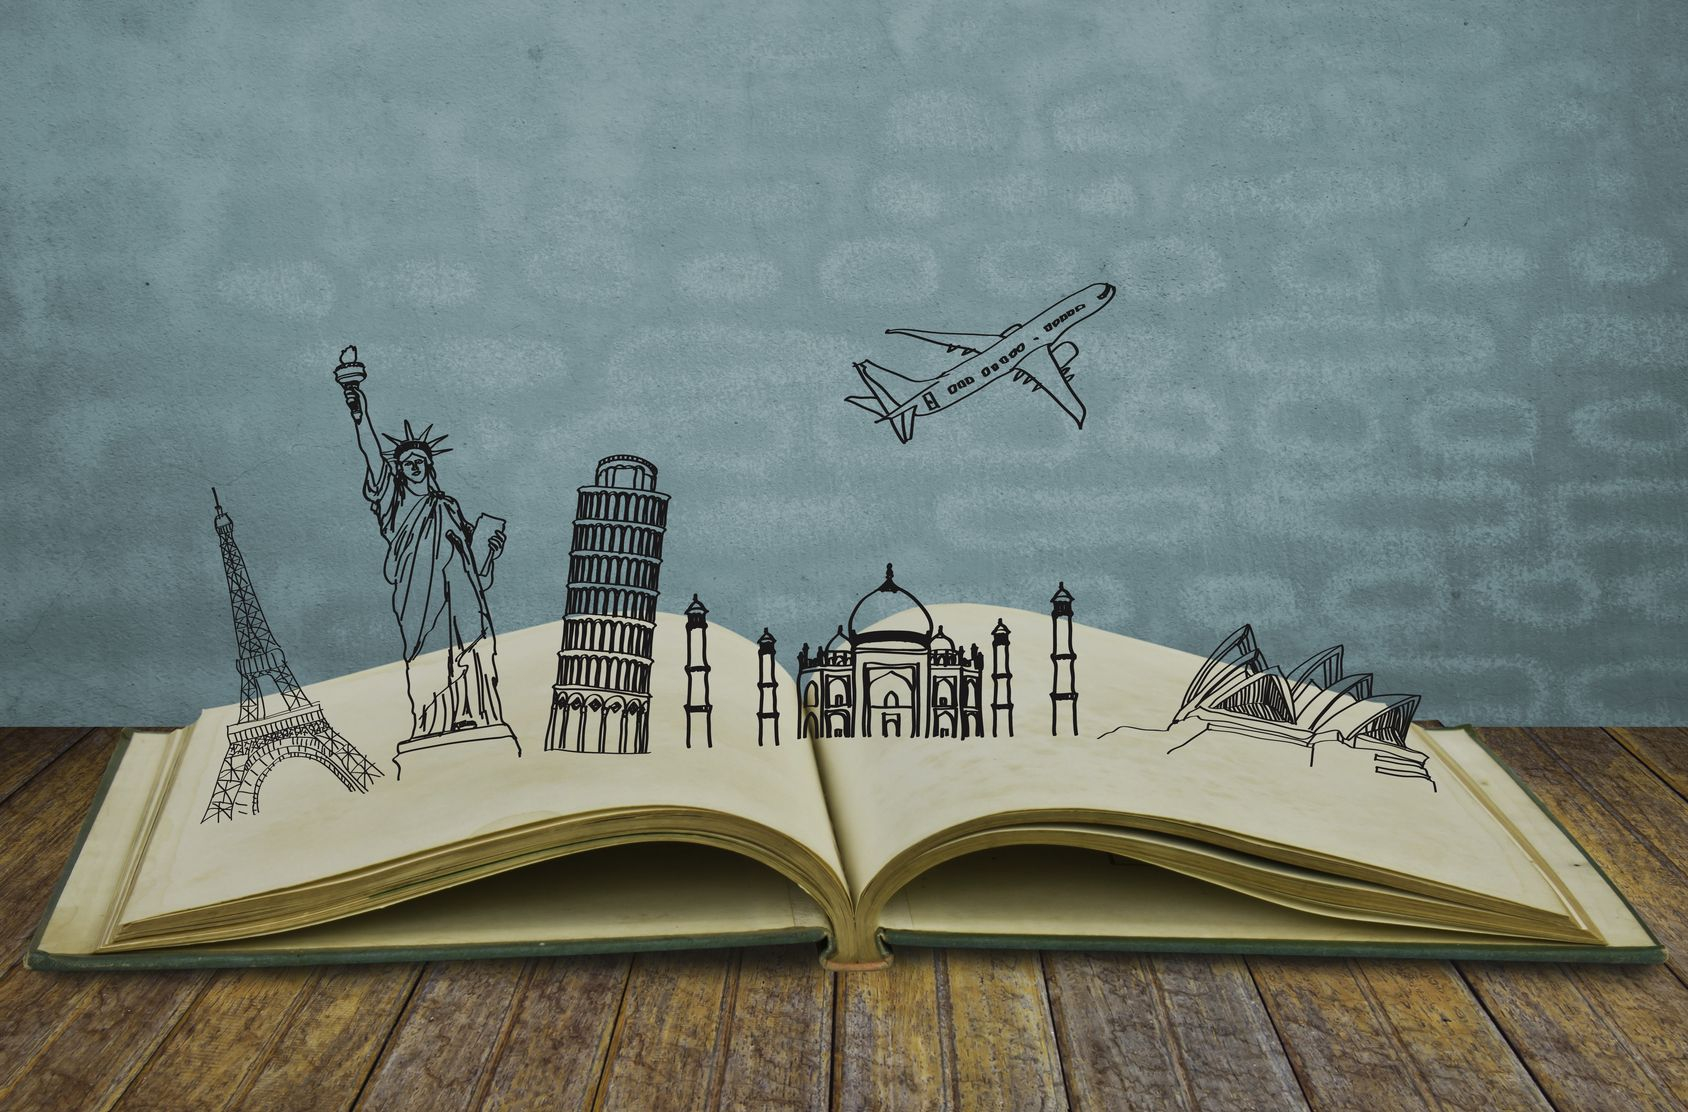 Книга о путешествиях с картинками